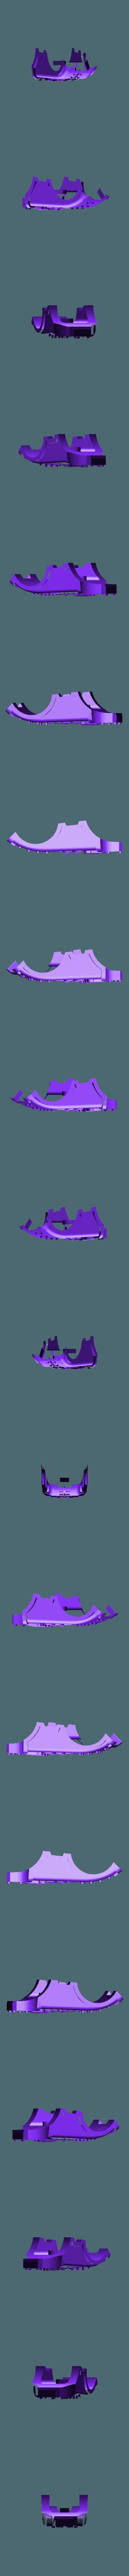 Aztec_Armiger_legarmor_V1.stl Download free STL file Aztec Armor Bearer  - Conversion Kit • Model to 3D print, ErikTheHeretek